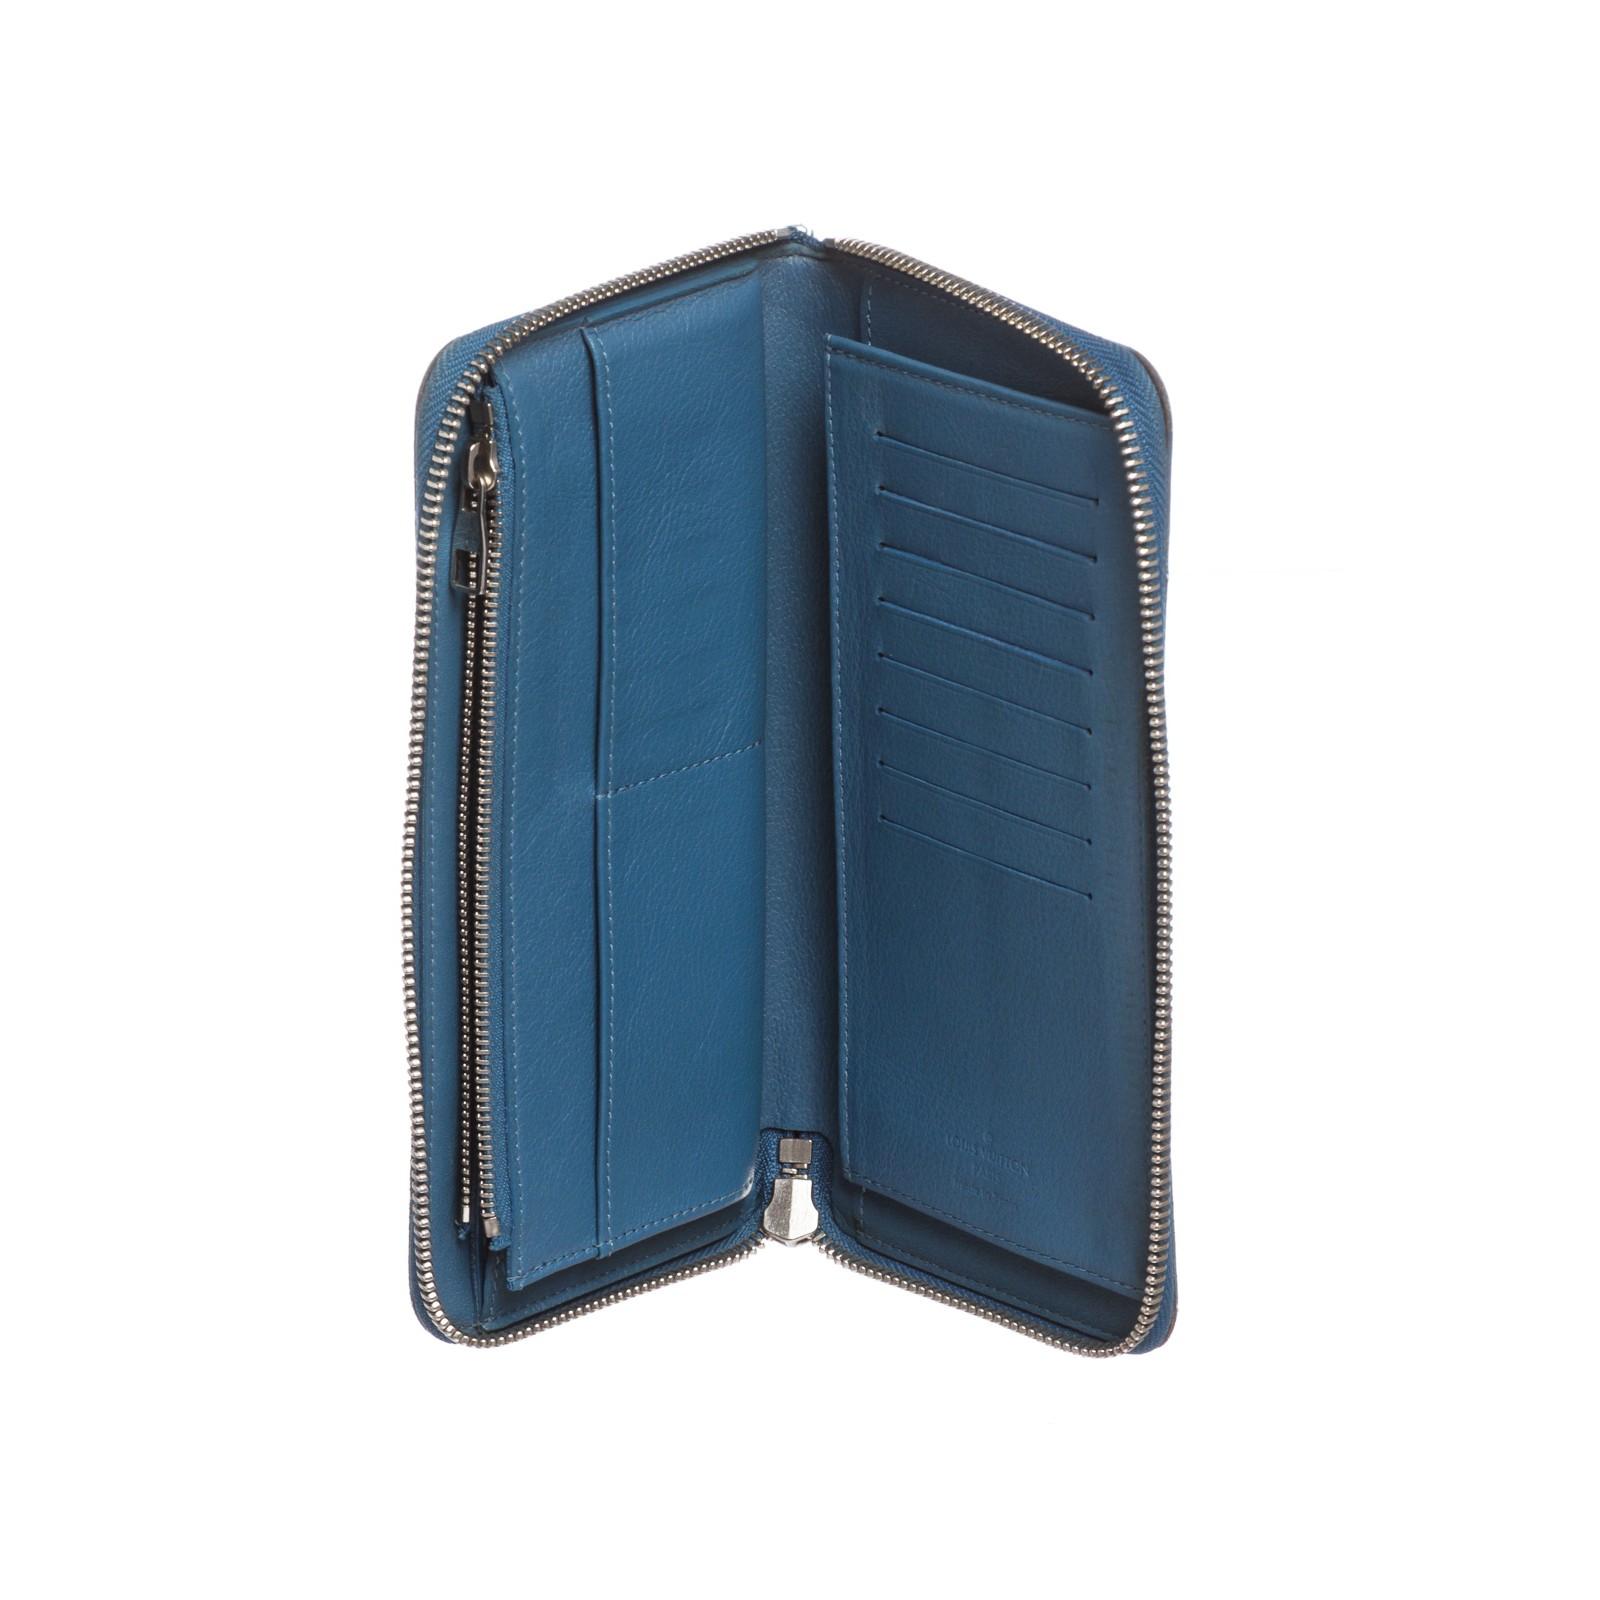 37bb295eb90 Louis Vuitton Blue Taurillon Leather Vertical Zippy Wallet